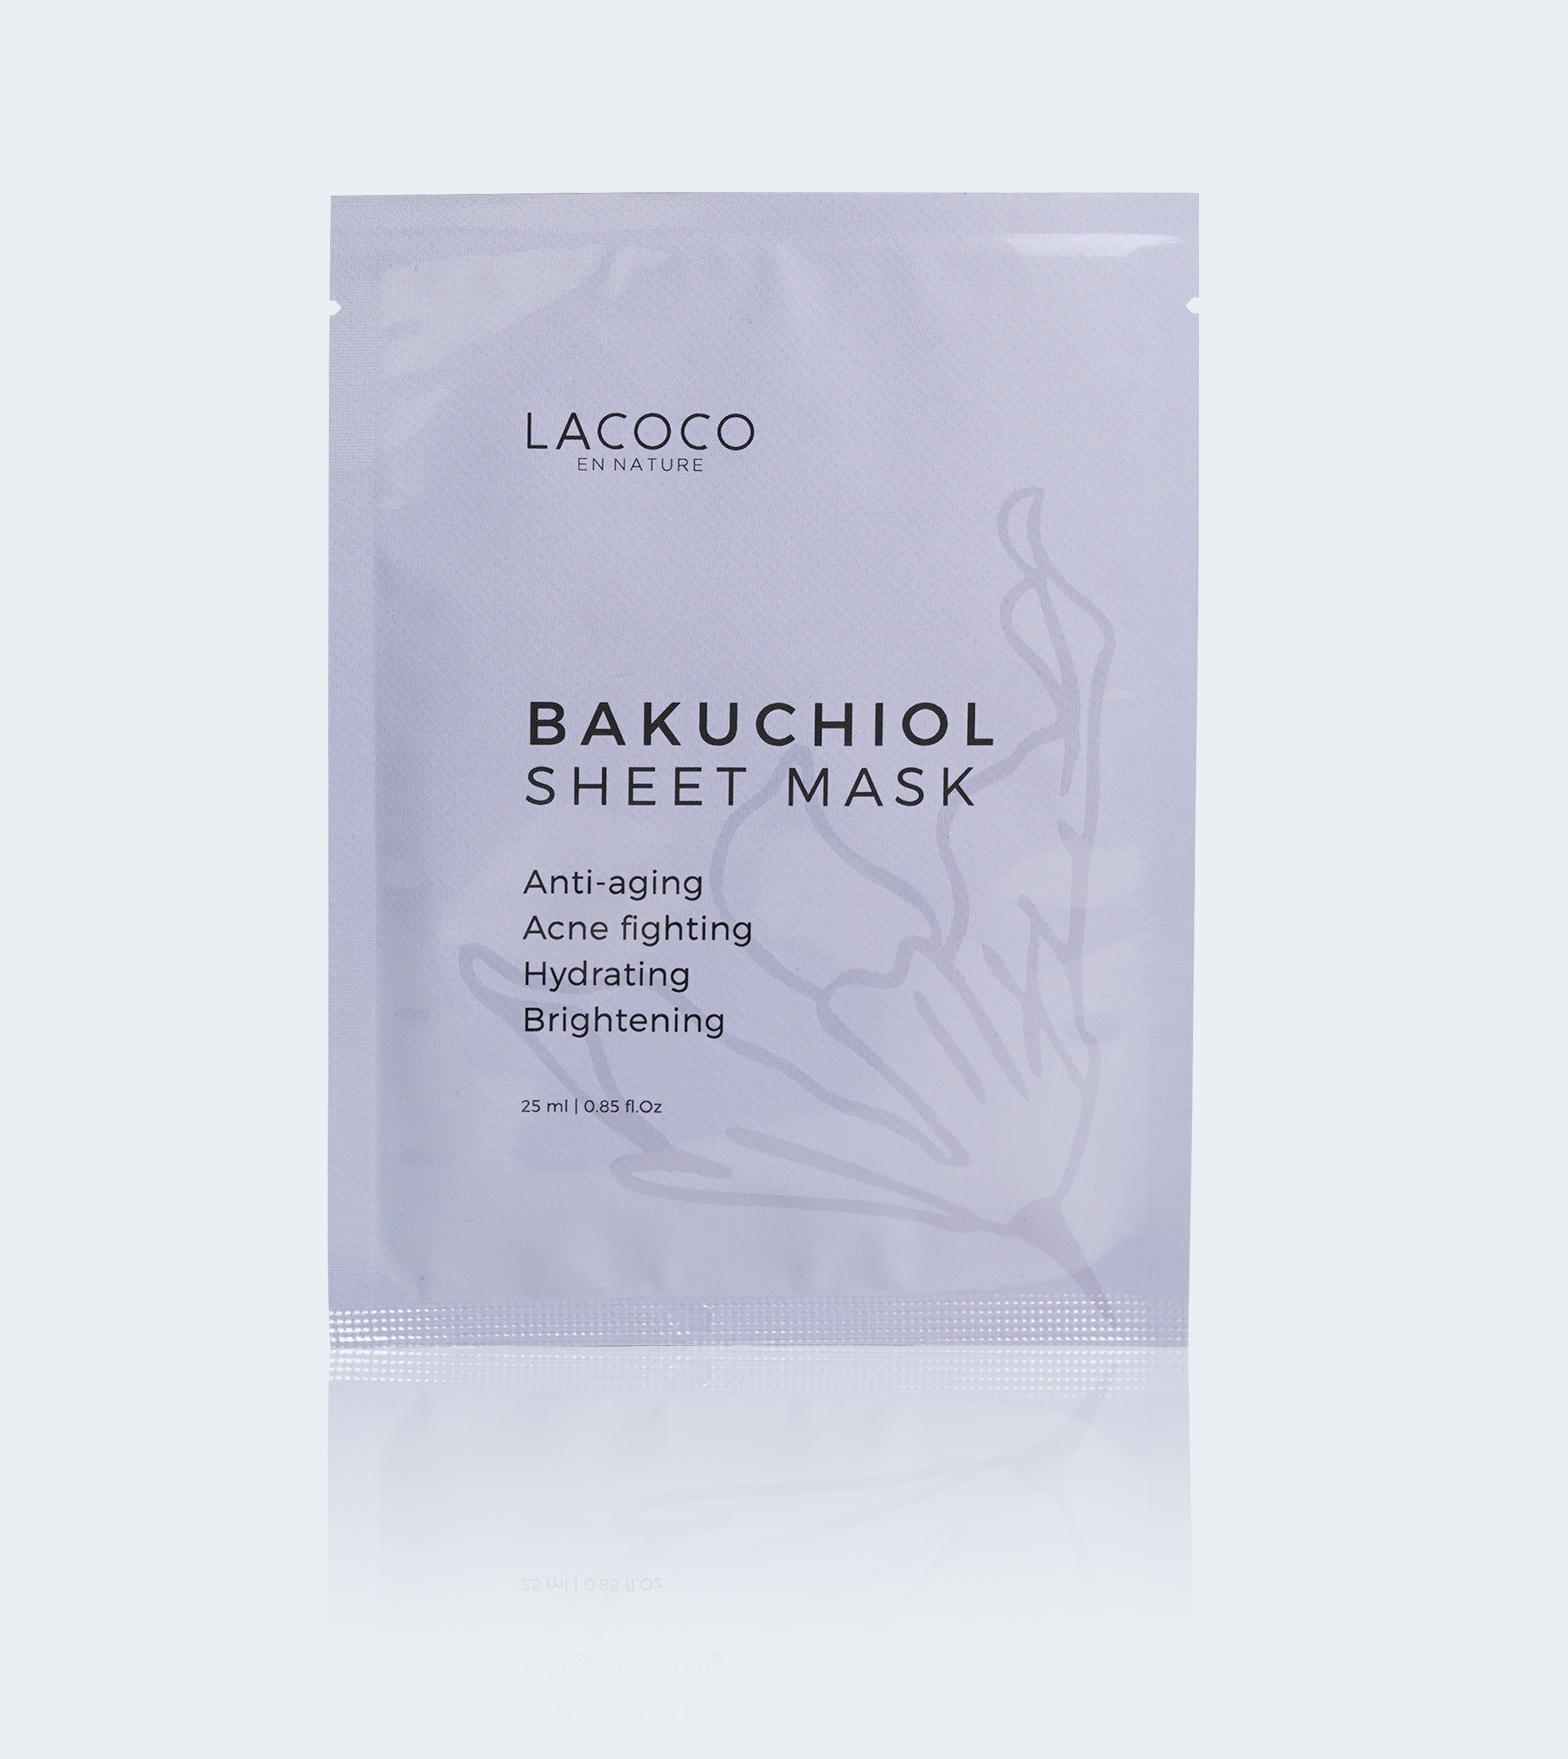 Bakuchiol Sheet Mask